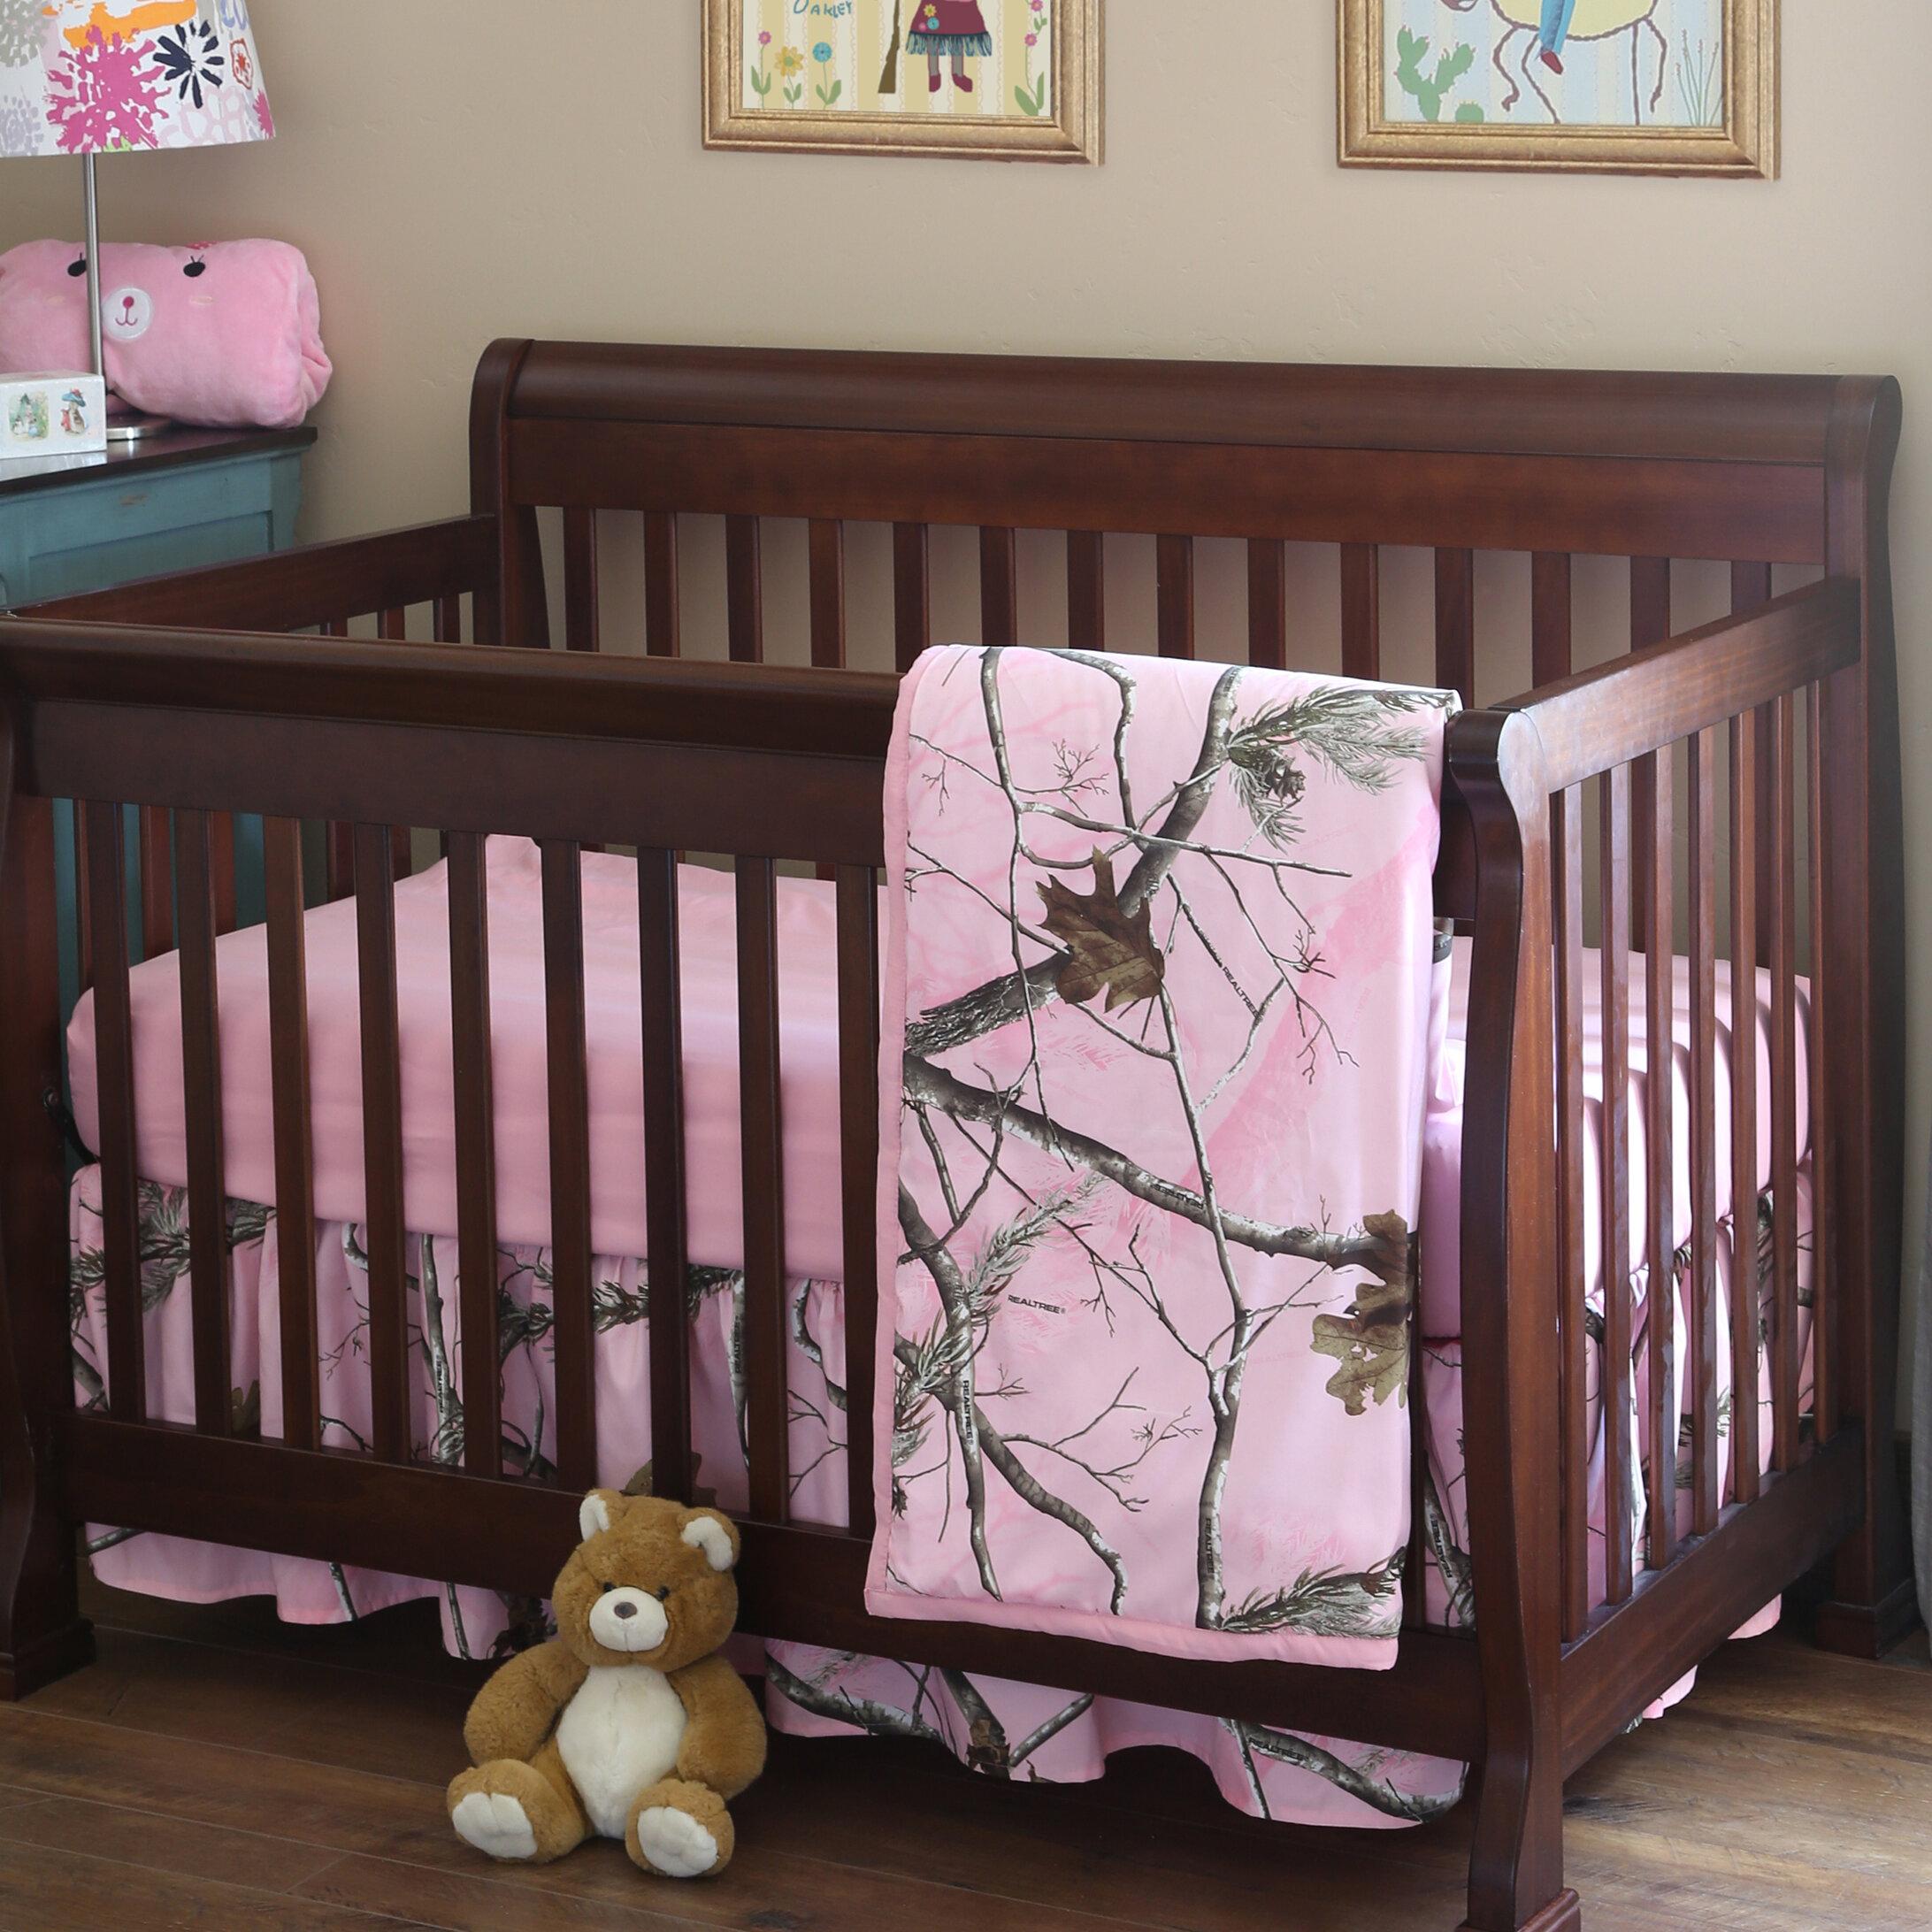 Realtree Realtree AP 3 Piece Crib Bedding Set   Reviews  ae6645cd7